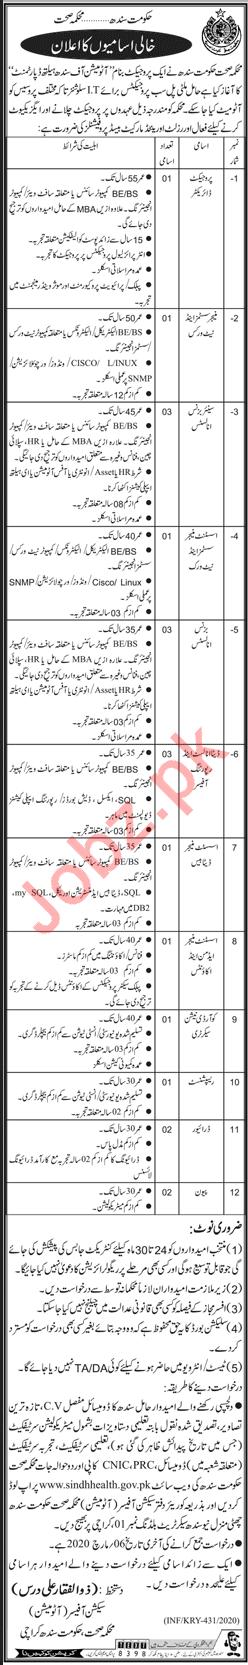 Sindh Health Department Job 2020 in Karachi